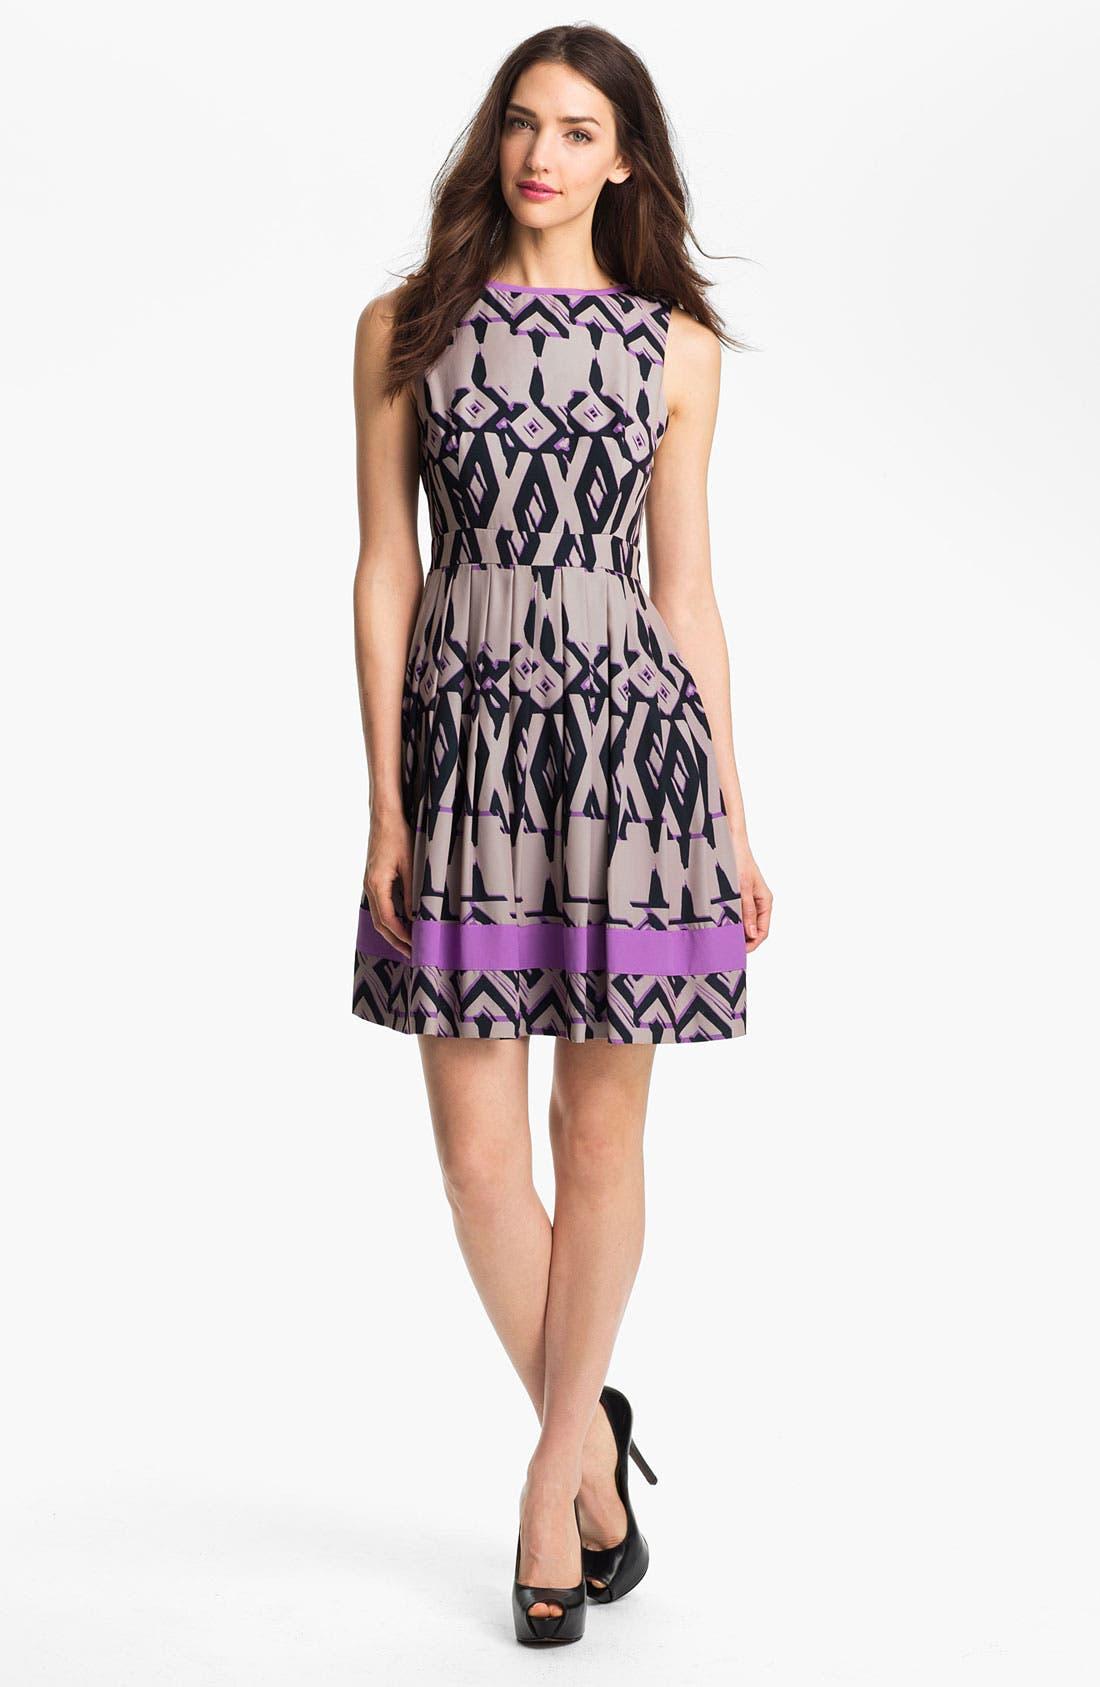 Alternate Image 1 Selected - Jessica Simpson Print Fit & Flare Dress